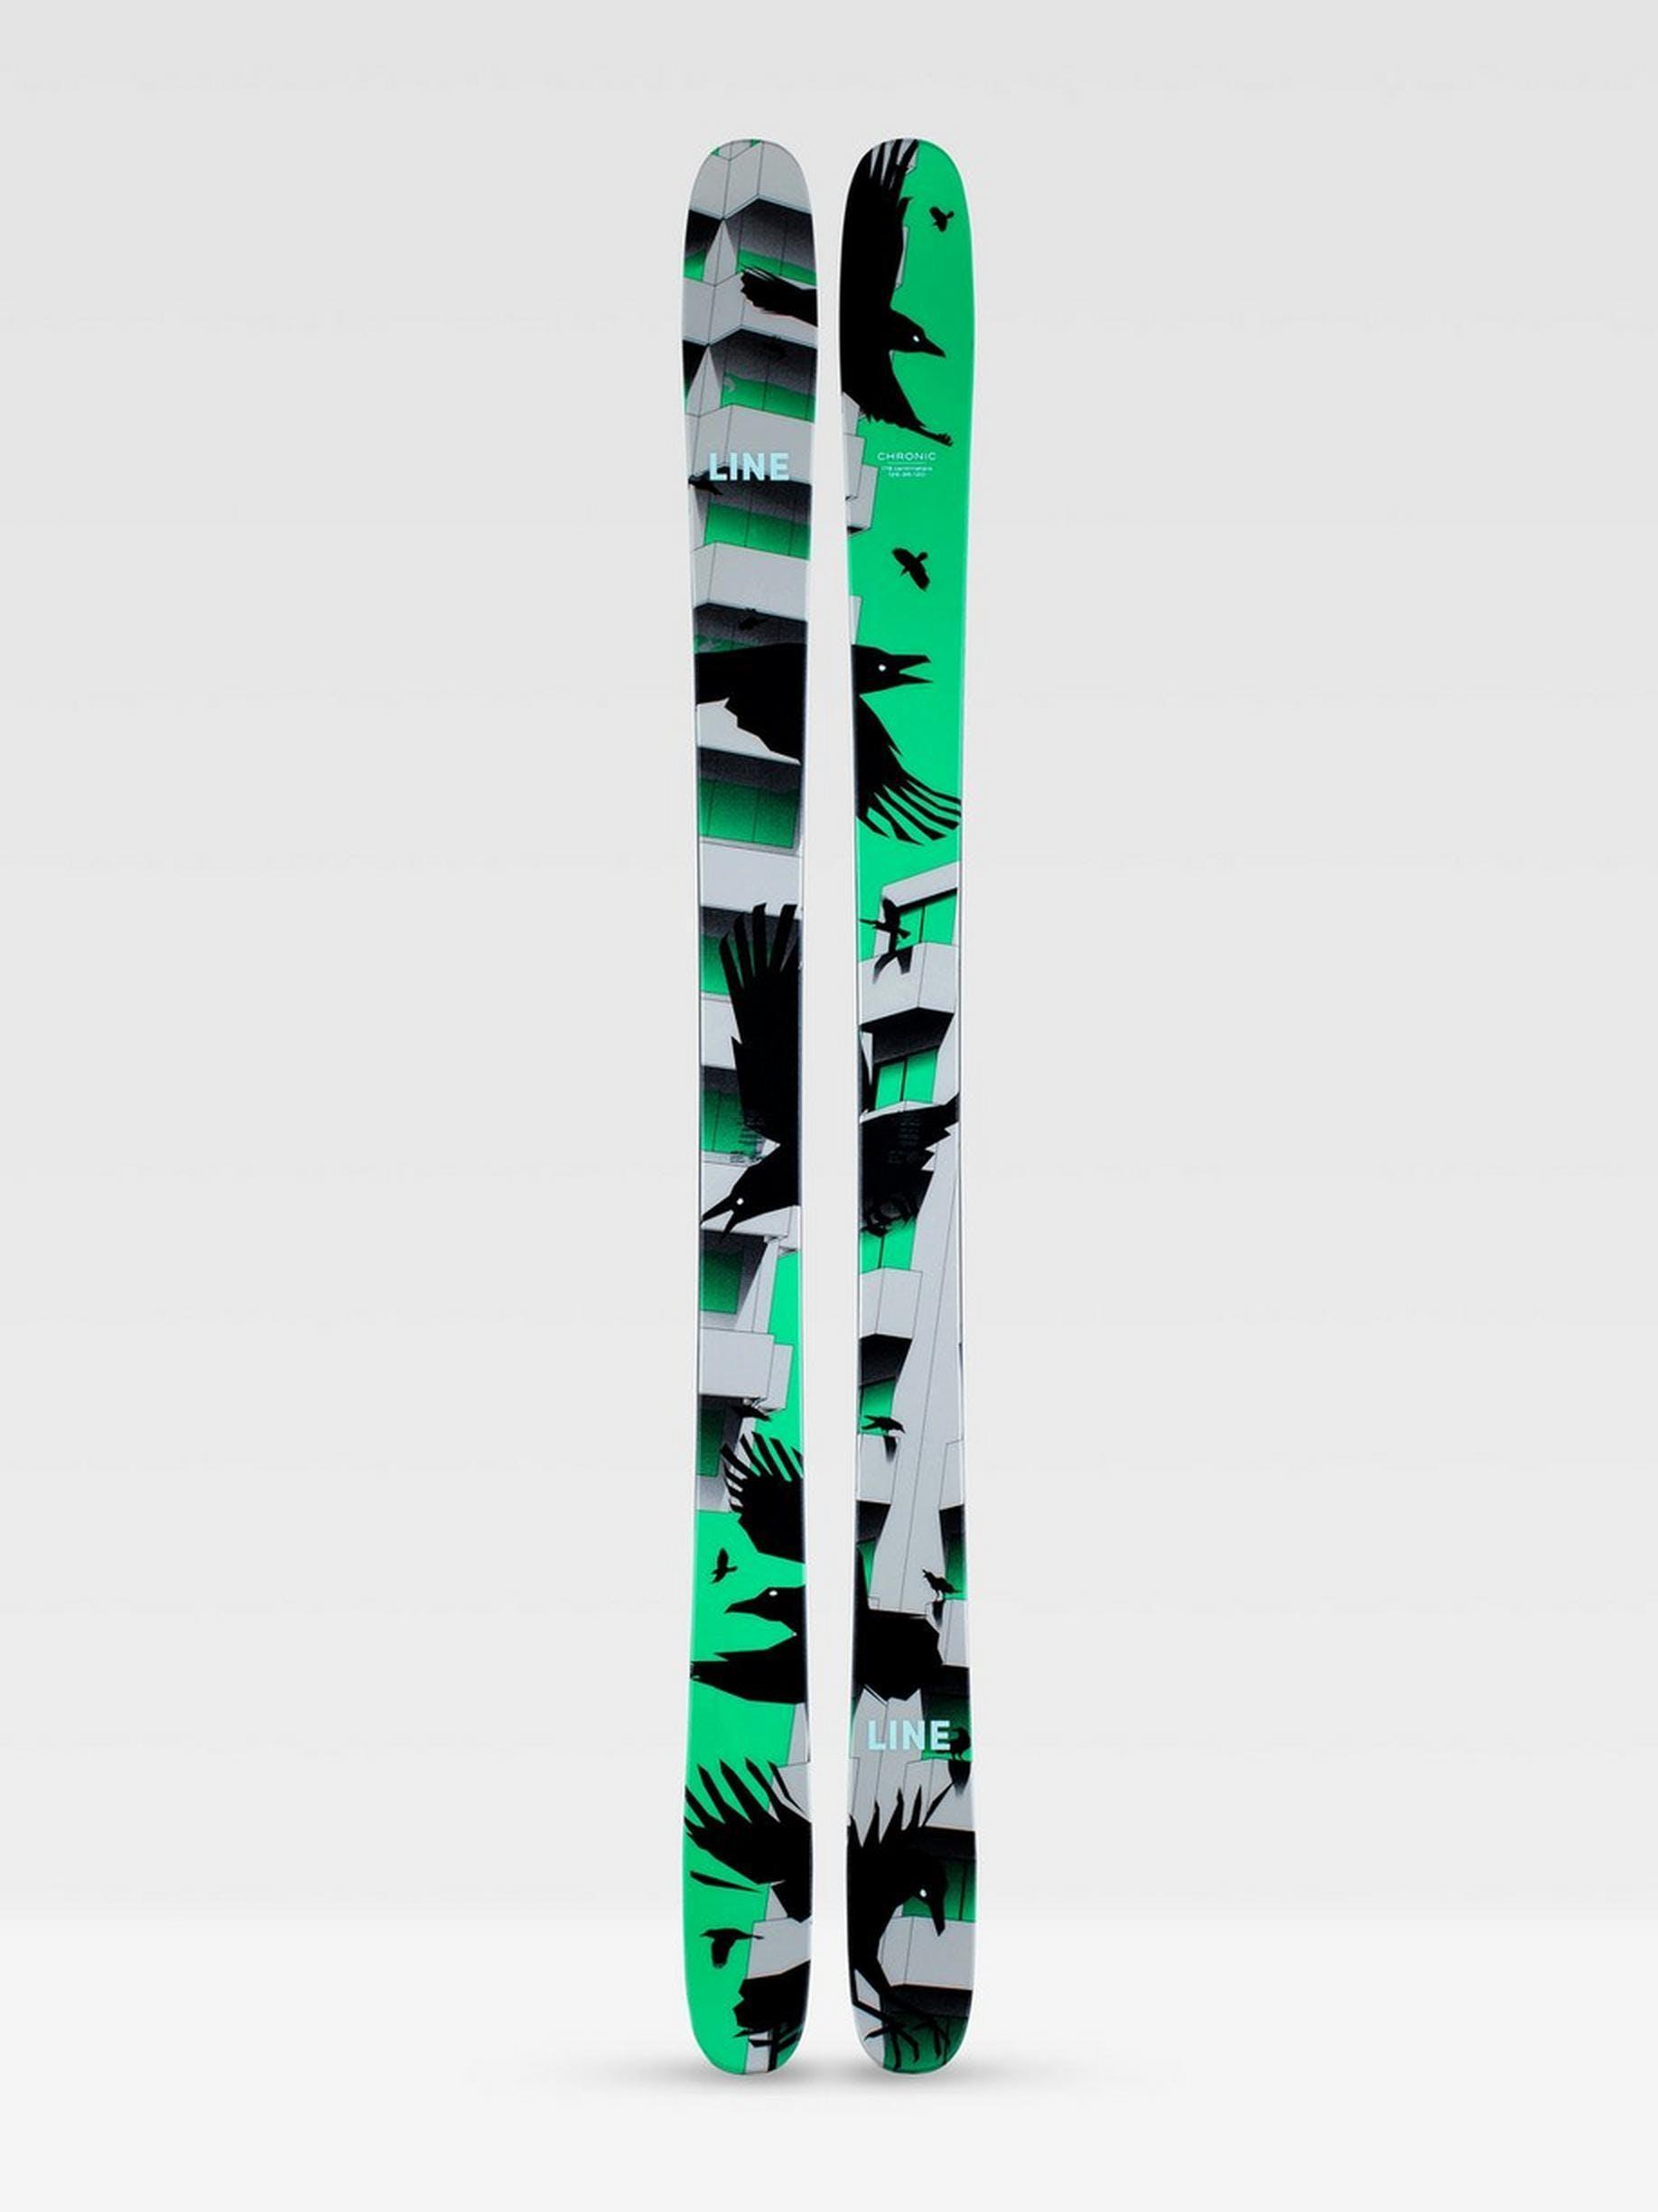 Line Chronic Skis · 2021